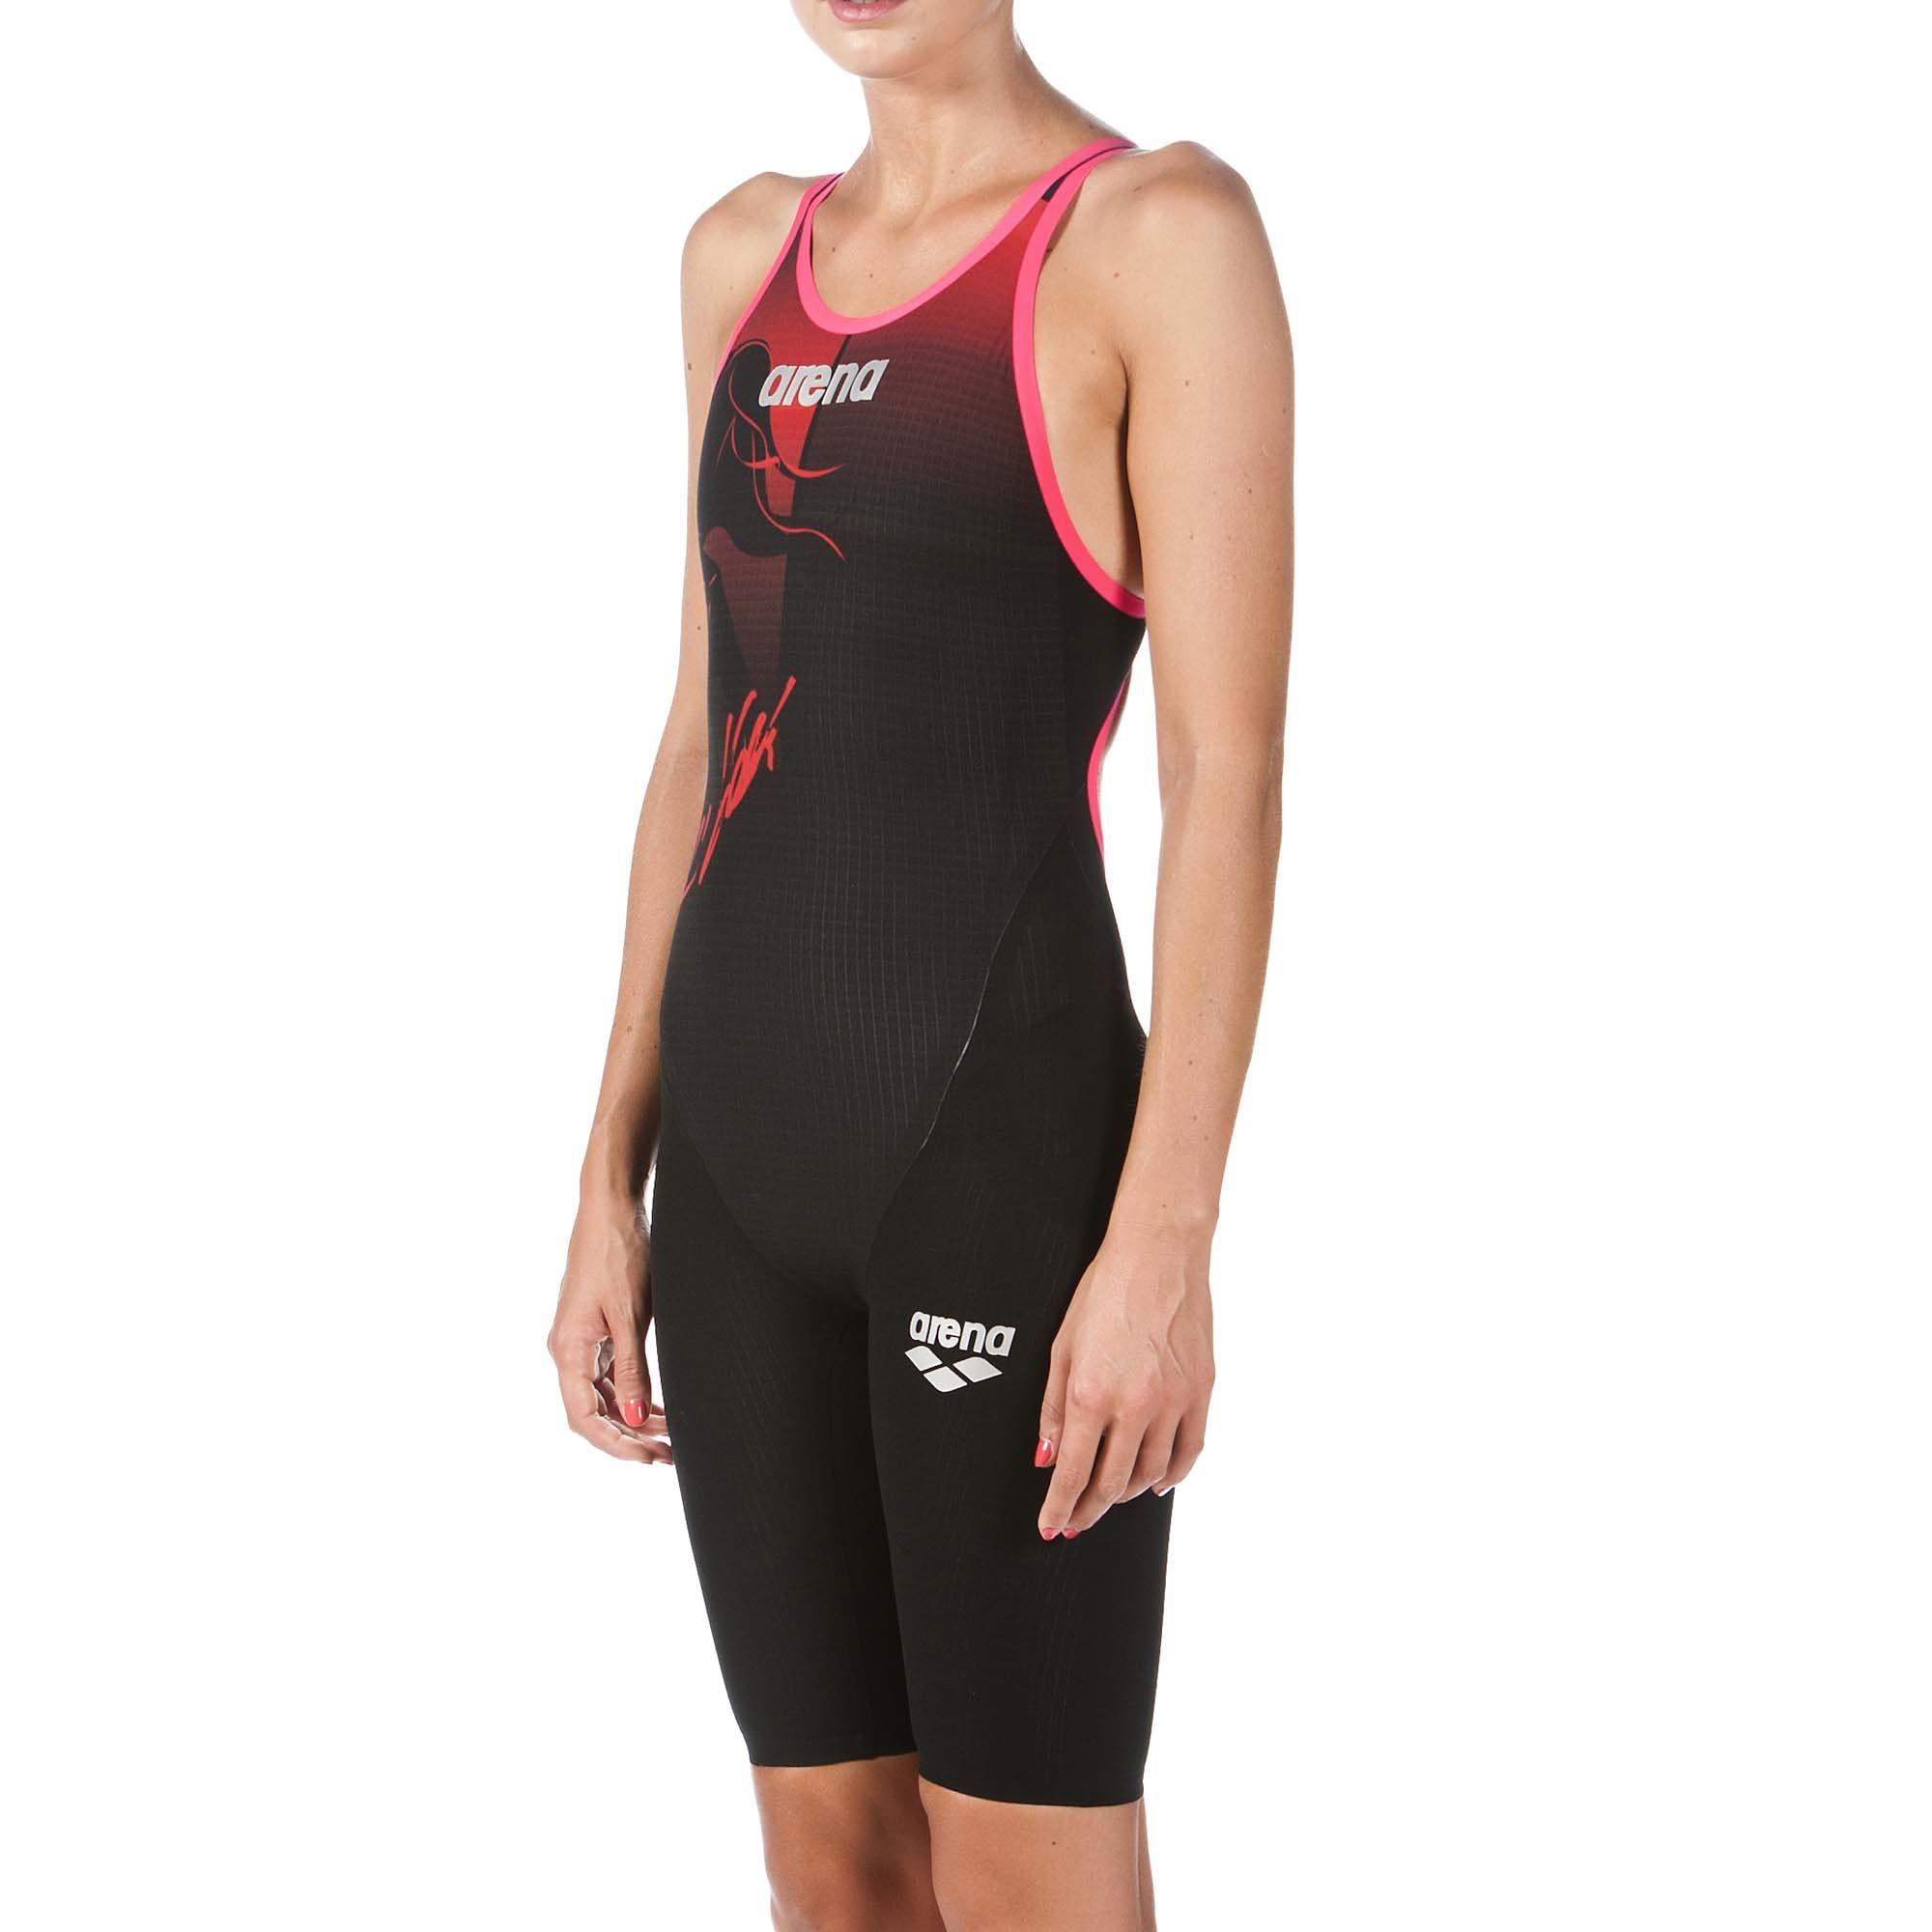 9e7f79657 Carbon Flex VX Kneesuit - Arena Powerskin Carbon Flex - Competition  Swimwear - COMPETITION